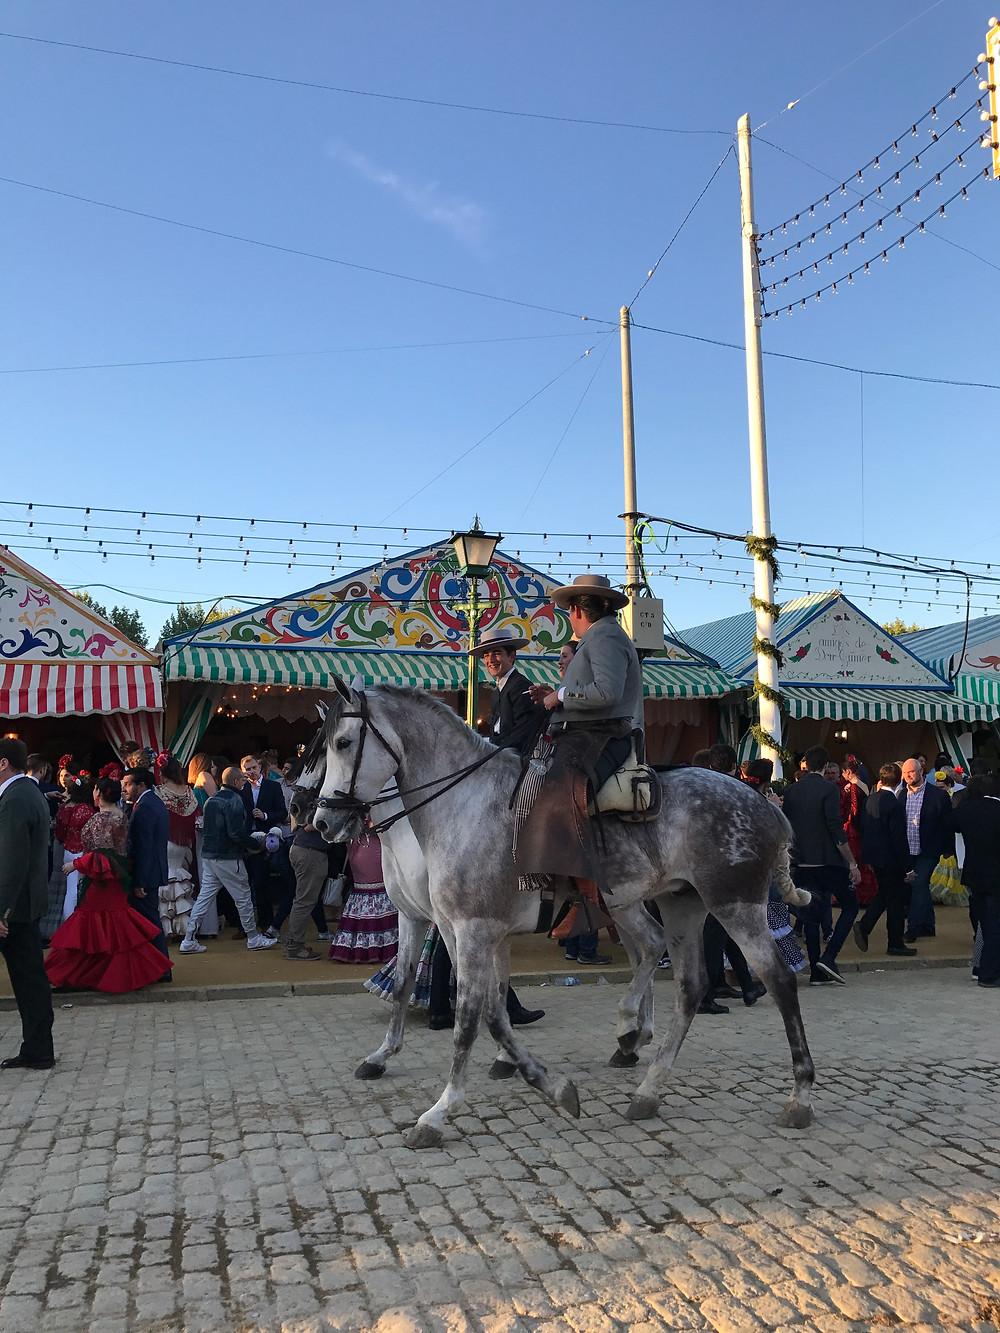 Feria de Abril | Lam in Louboutins